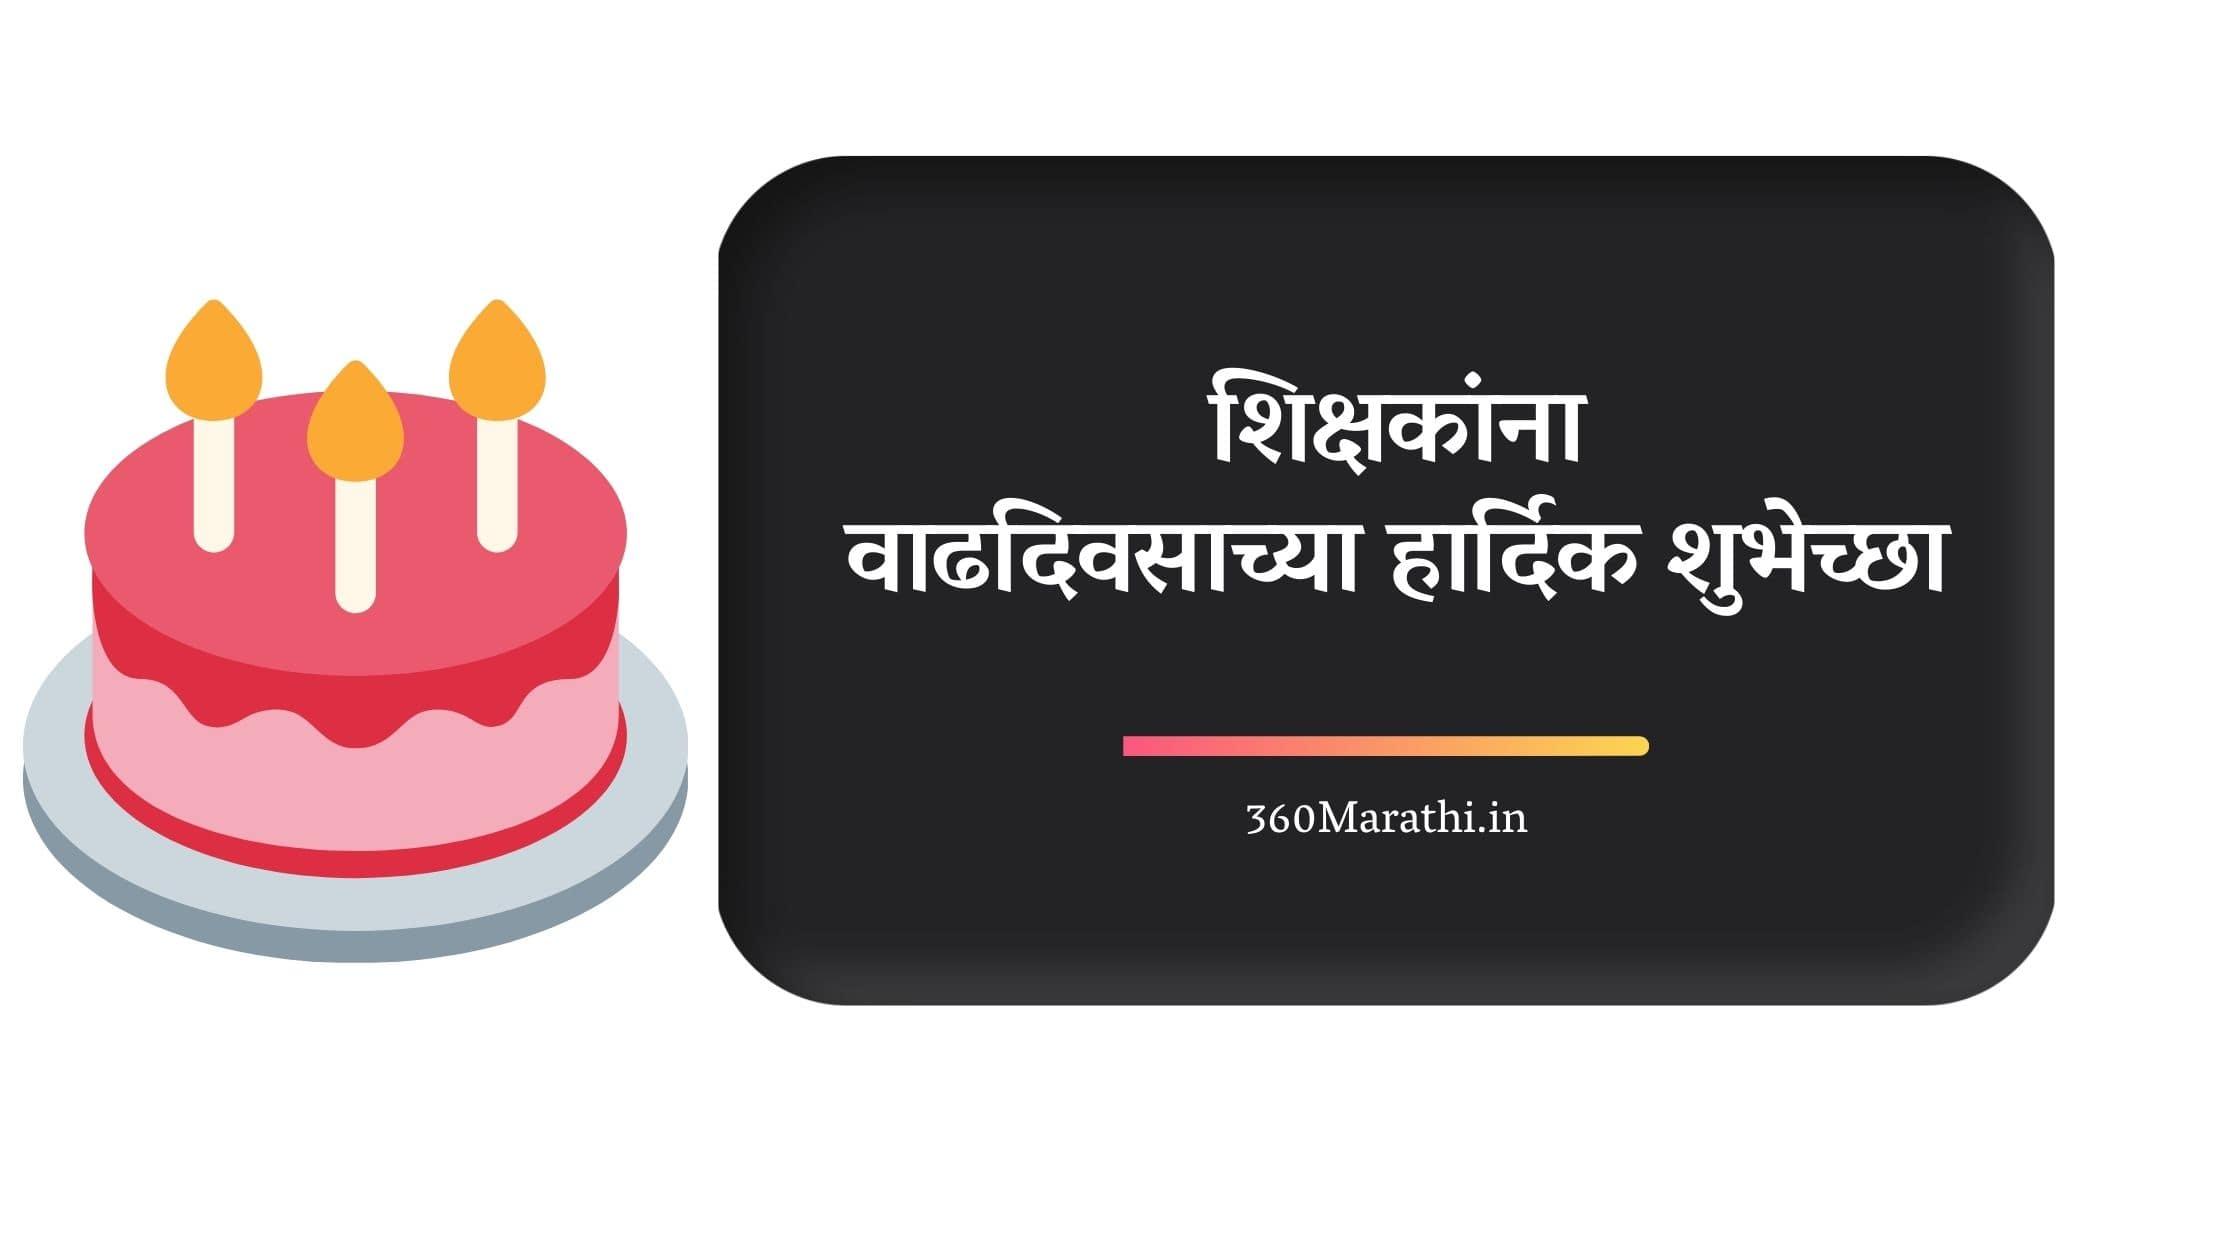 Birthday Wishes in Marathi for Teacher   शिक्षकांना वाढदिवसाच्या हार्दिक शुभेच्छा